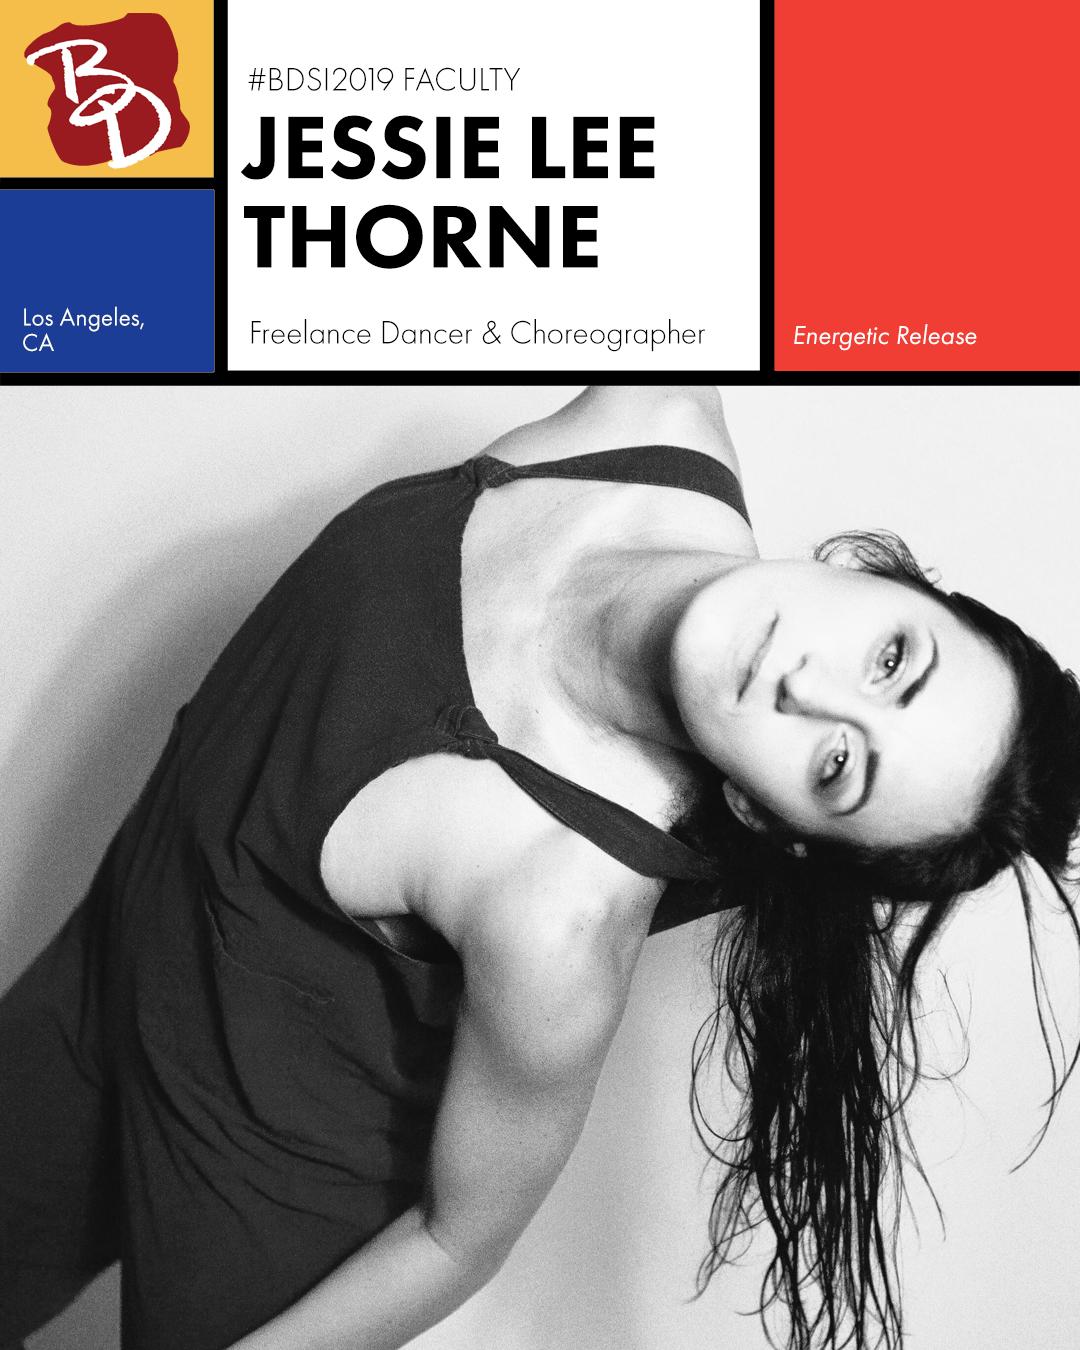 Faculty Announcement - Thorne Jessie Lee.jpg